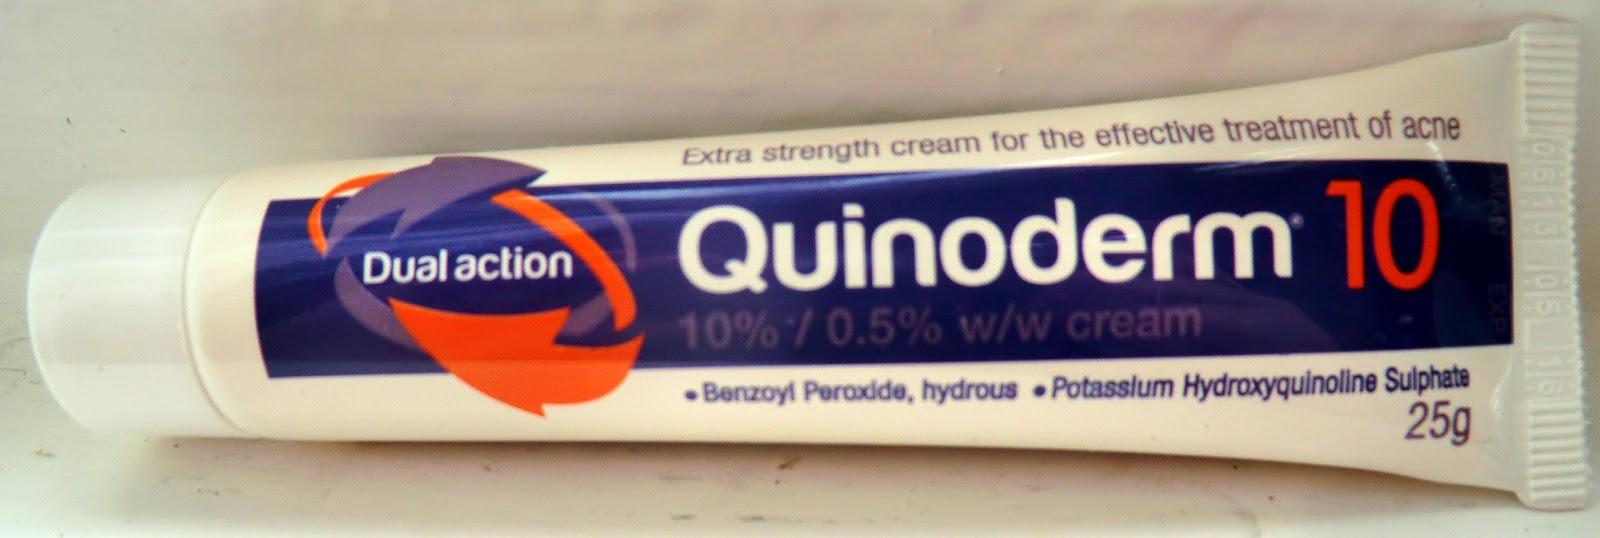 Obat Penghilang Jerawat Memakai Quinoderm Cream